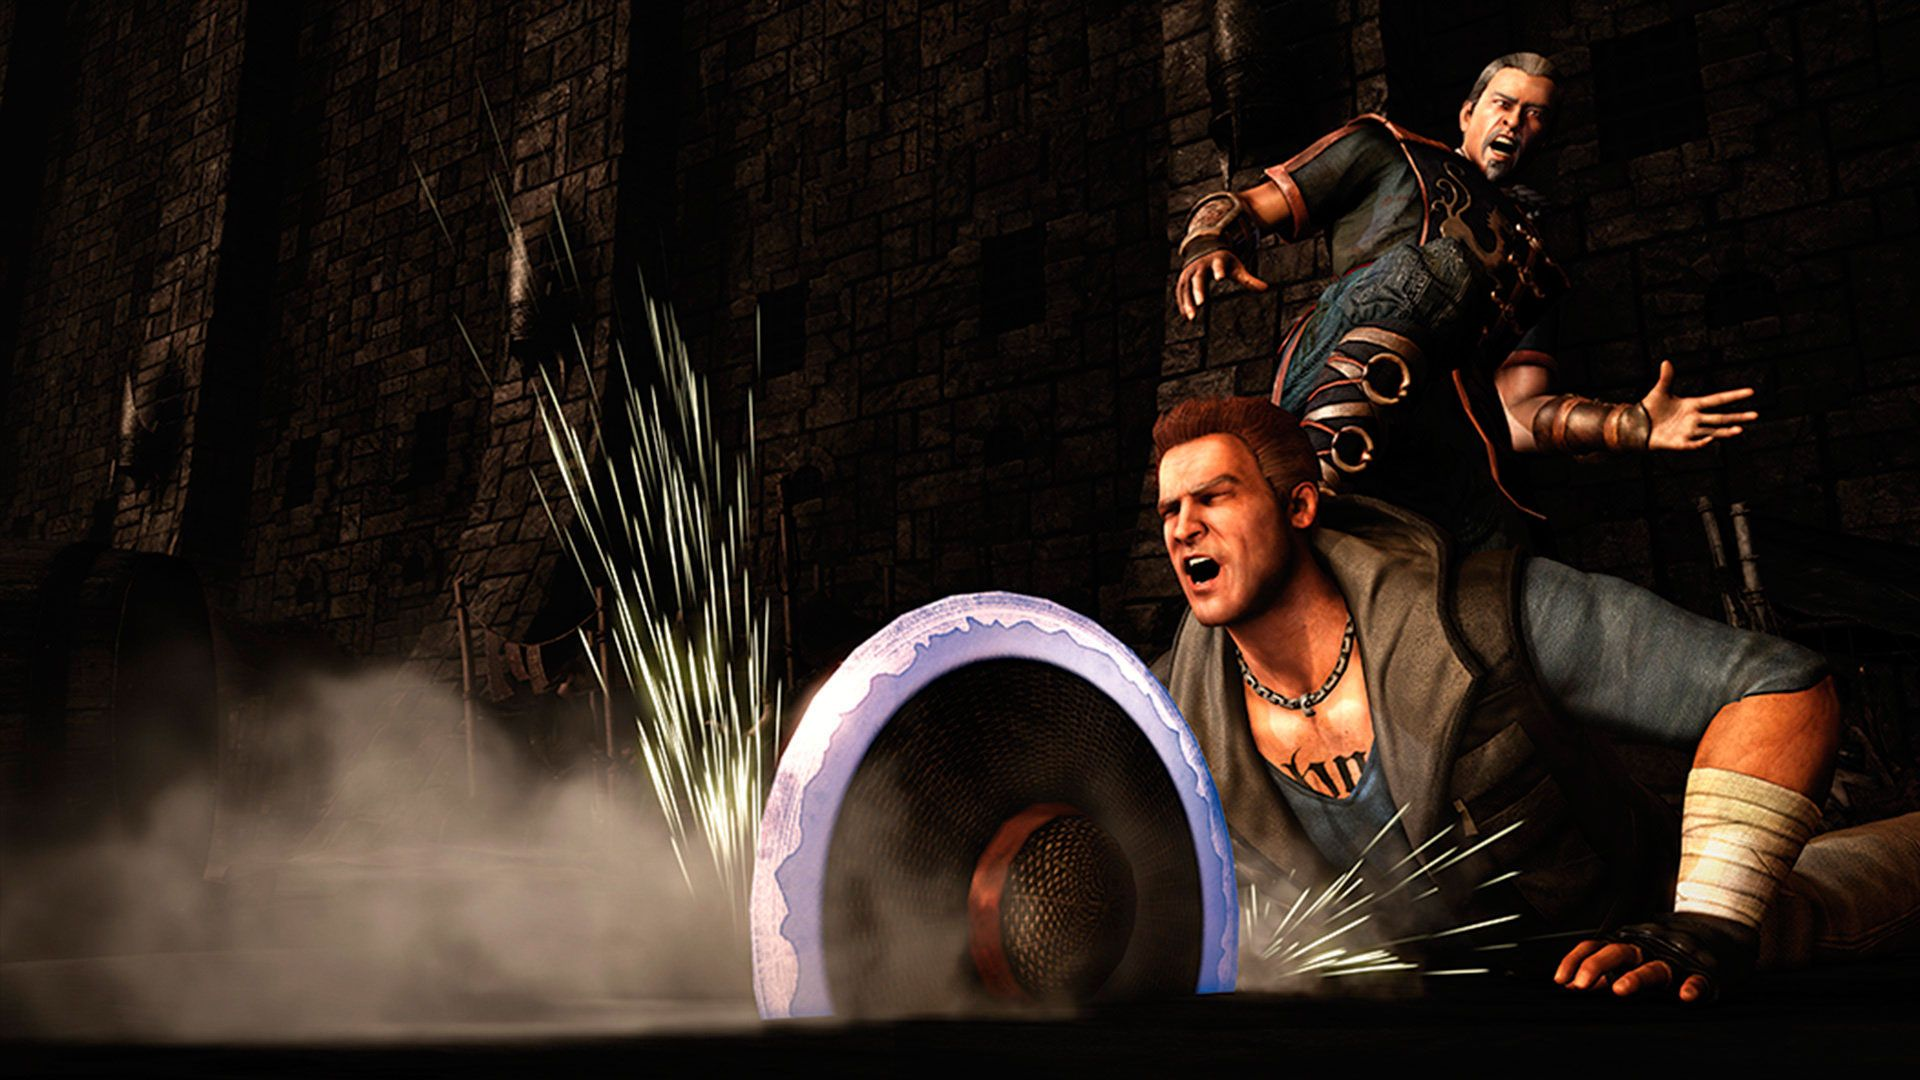 Mortal Kombat XL изображение 2